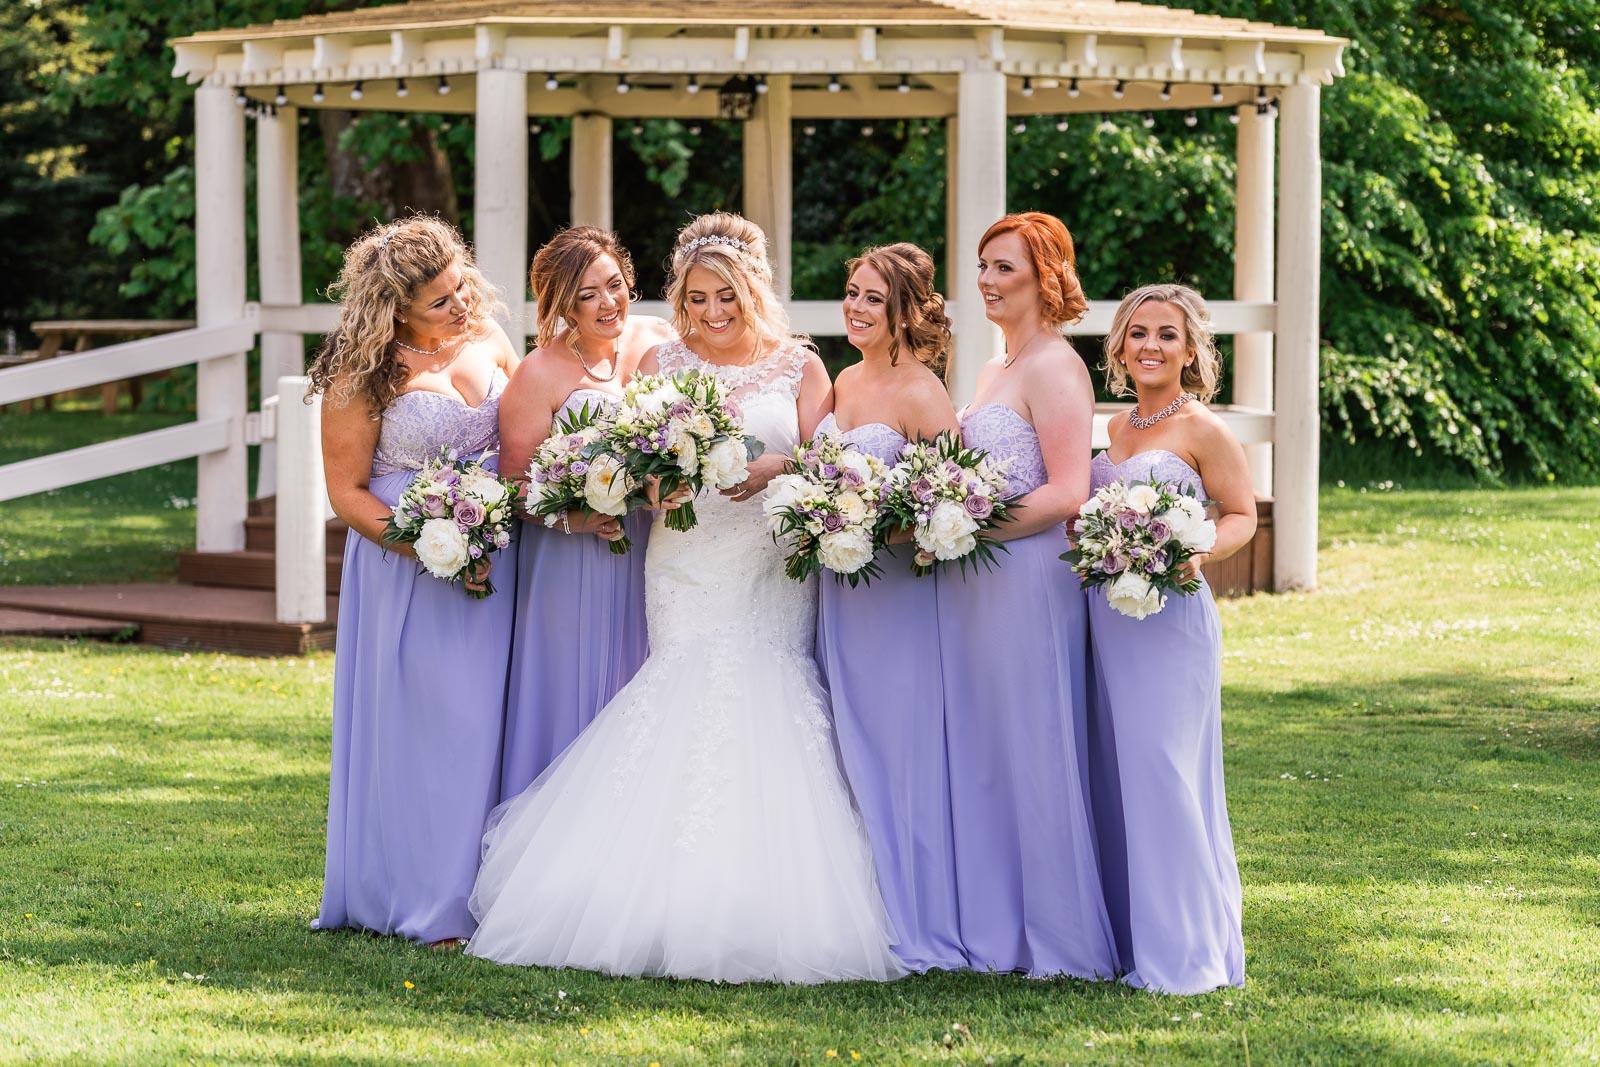 cornhill_castle_wedding_biggar_dearlyphotography (179 of 448).jpg